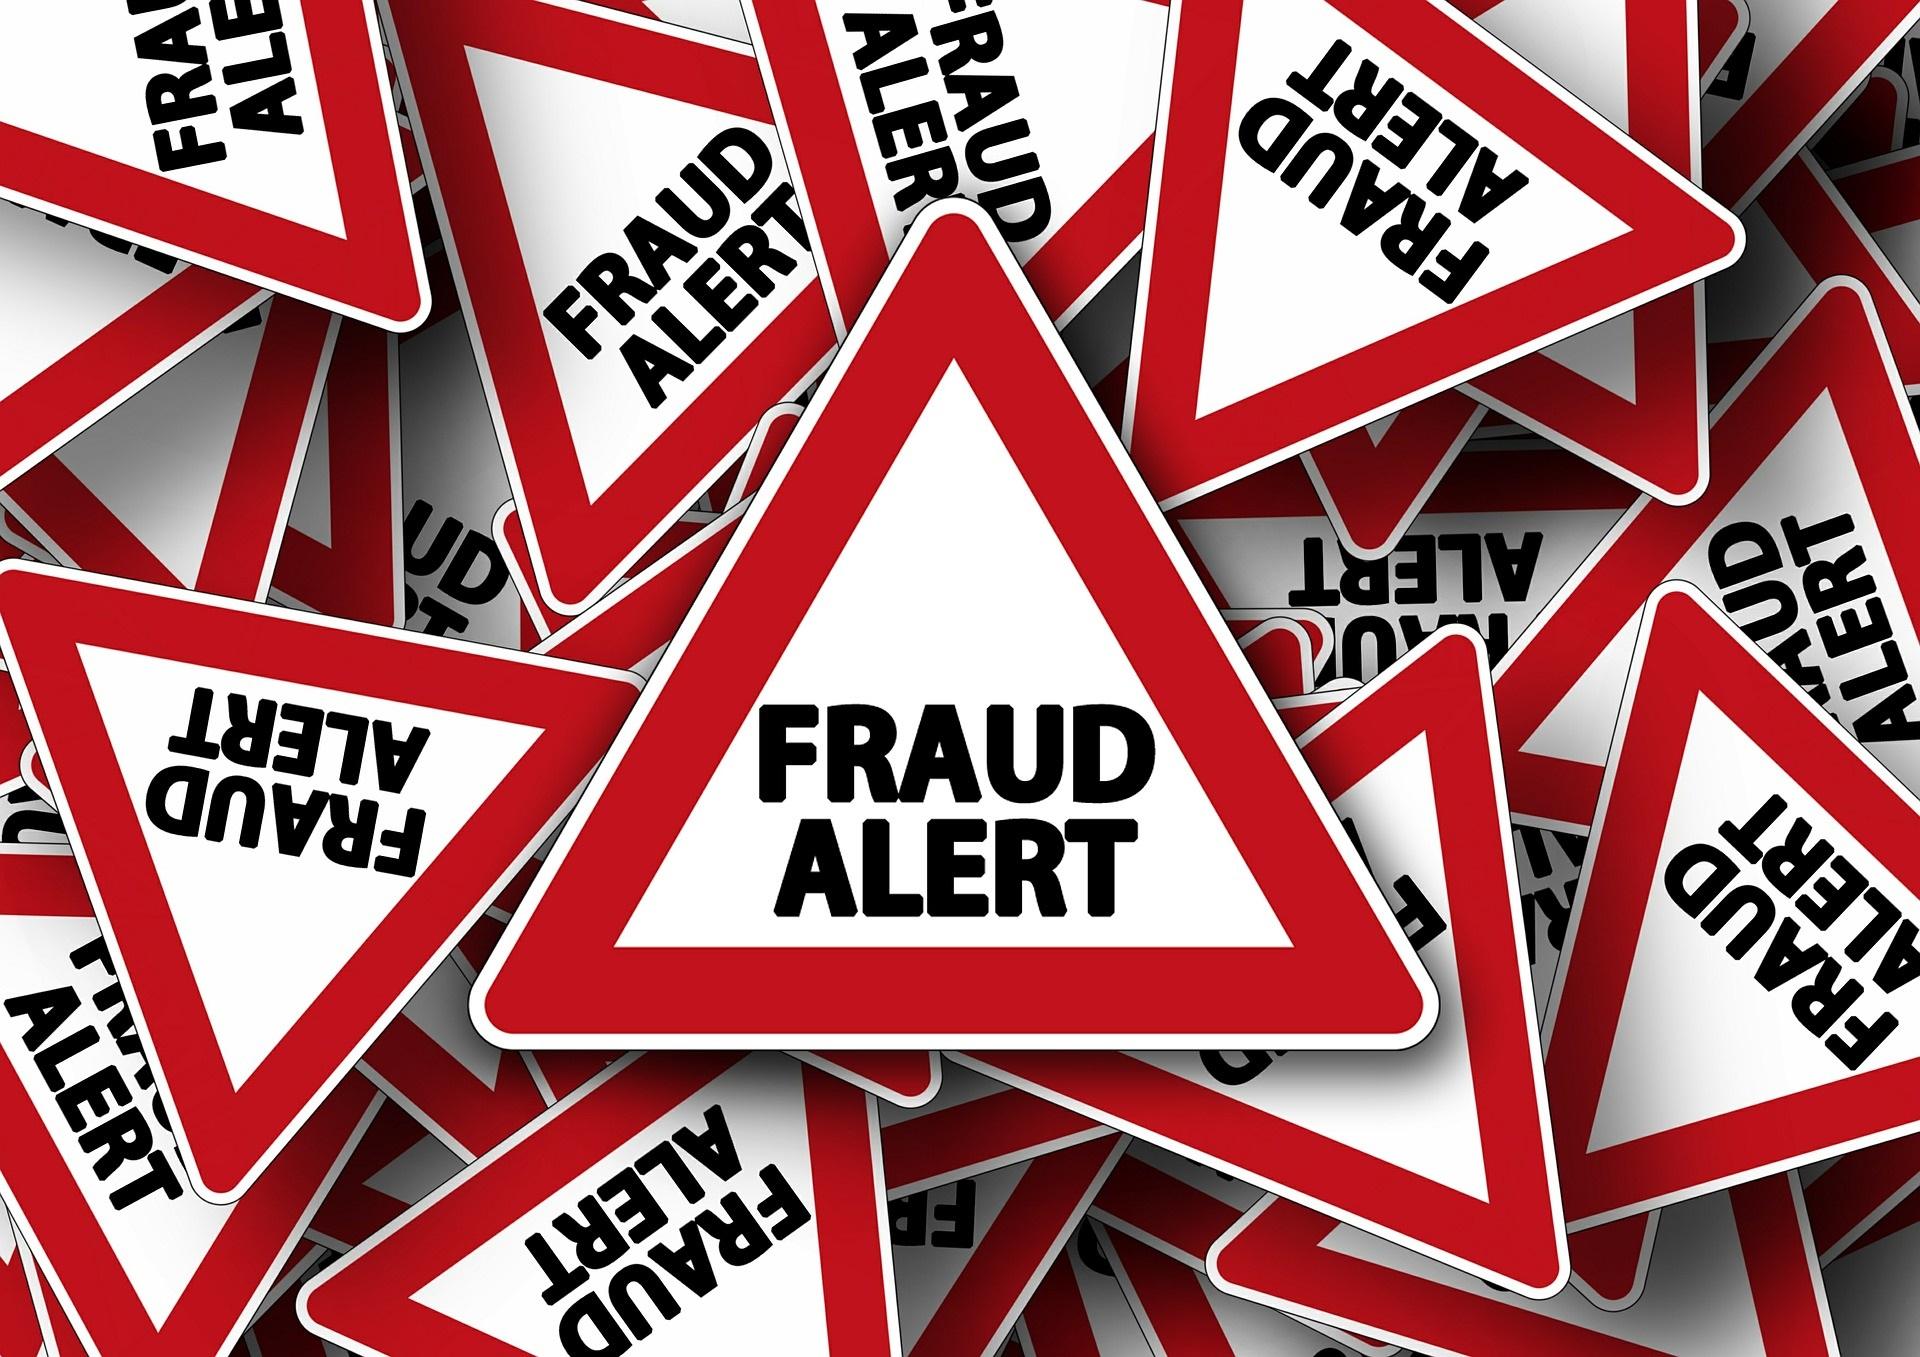 Fraud_Alert_sign-2.jpg